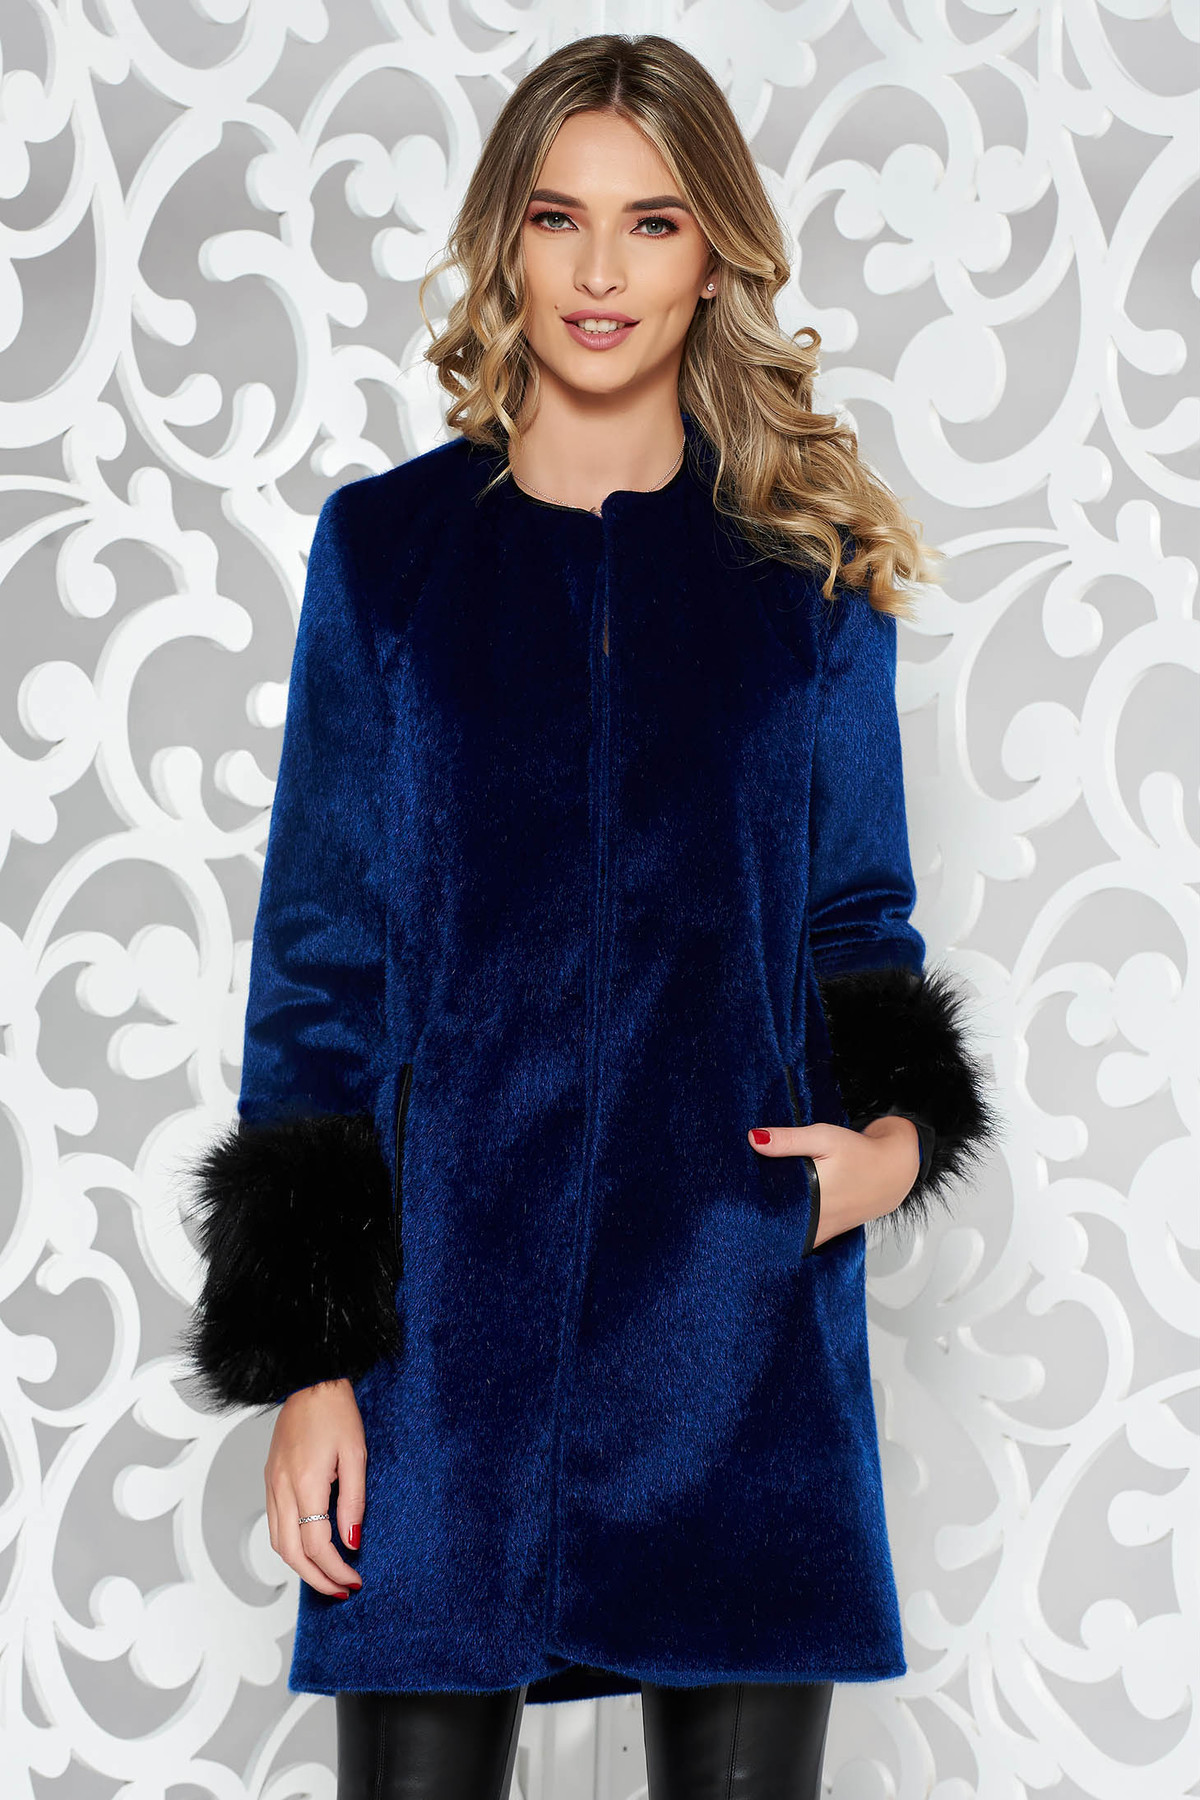 Palton StarShinerS albastru-inchis elegant cu croi larg din blana ecologica captusit pe interior cu buzunare